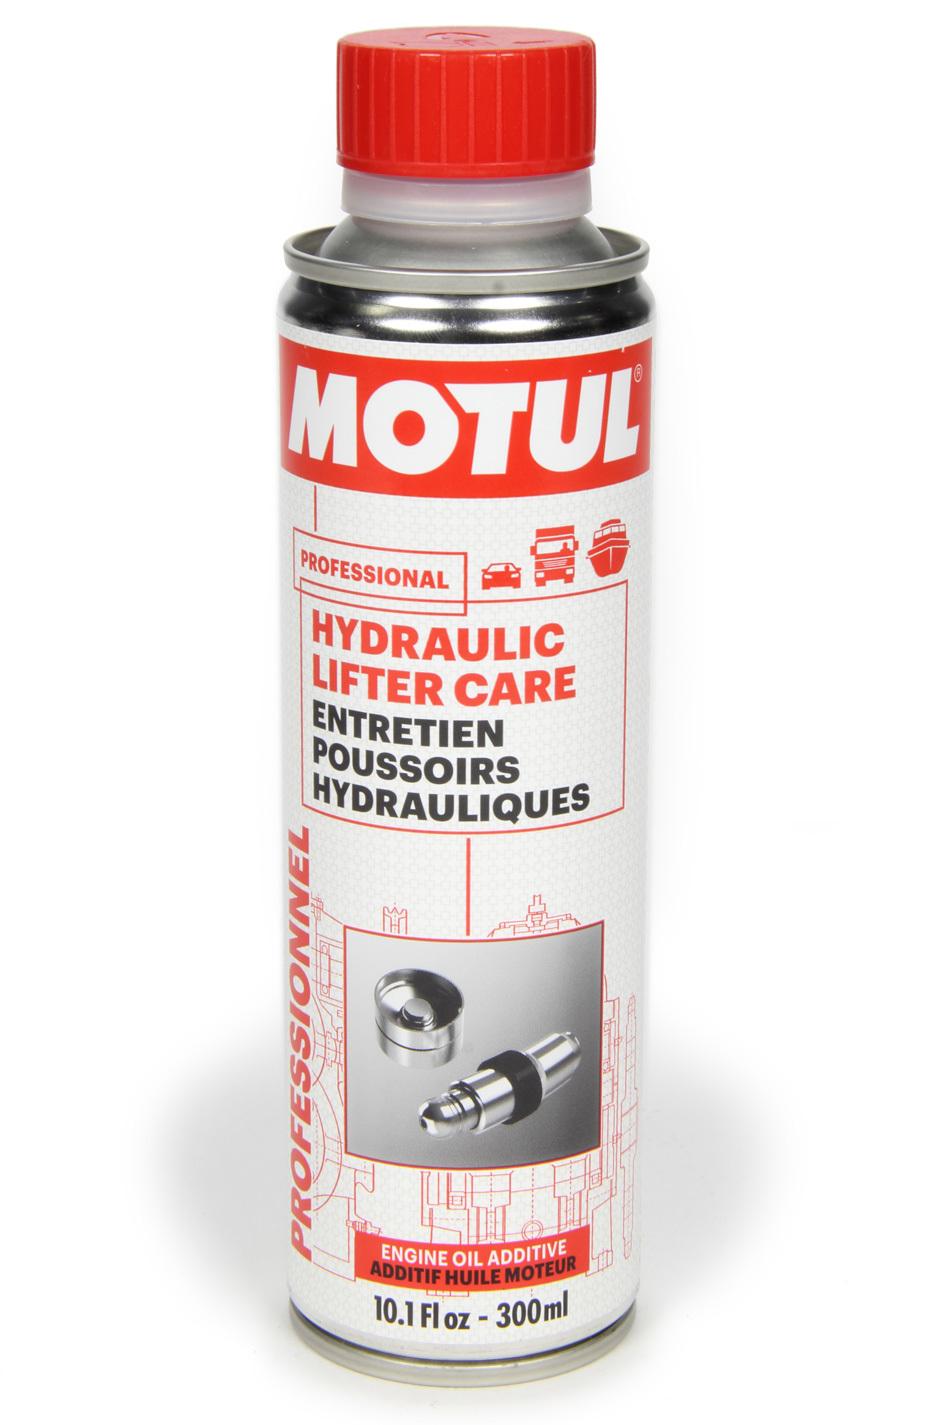 Motul Usa Hydraulic Lifter Care 10oz